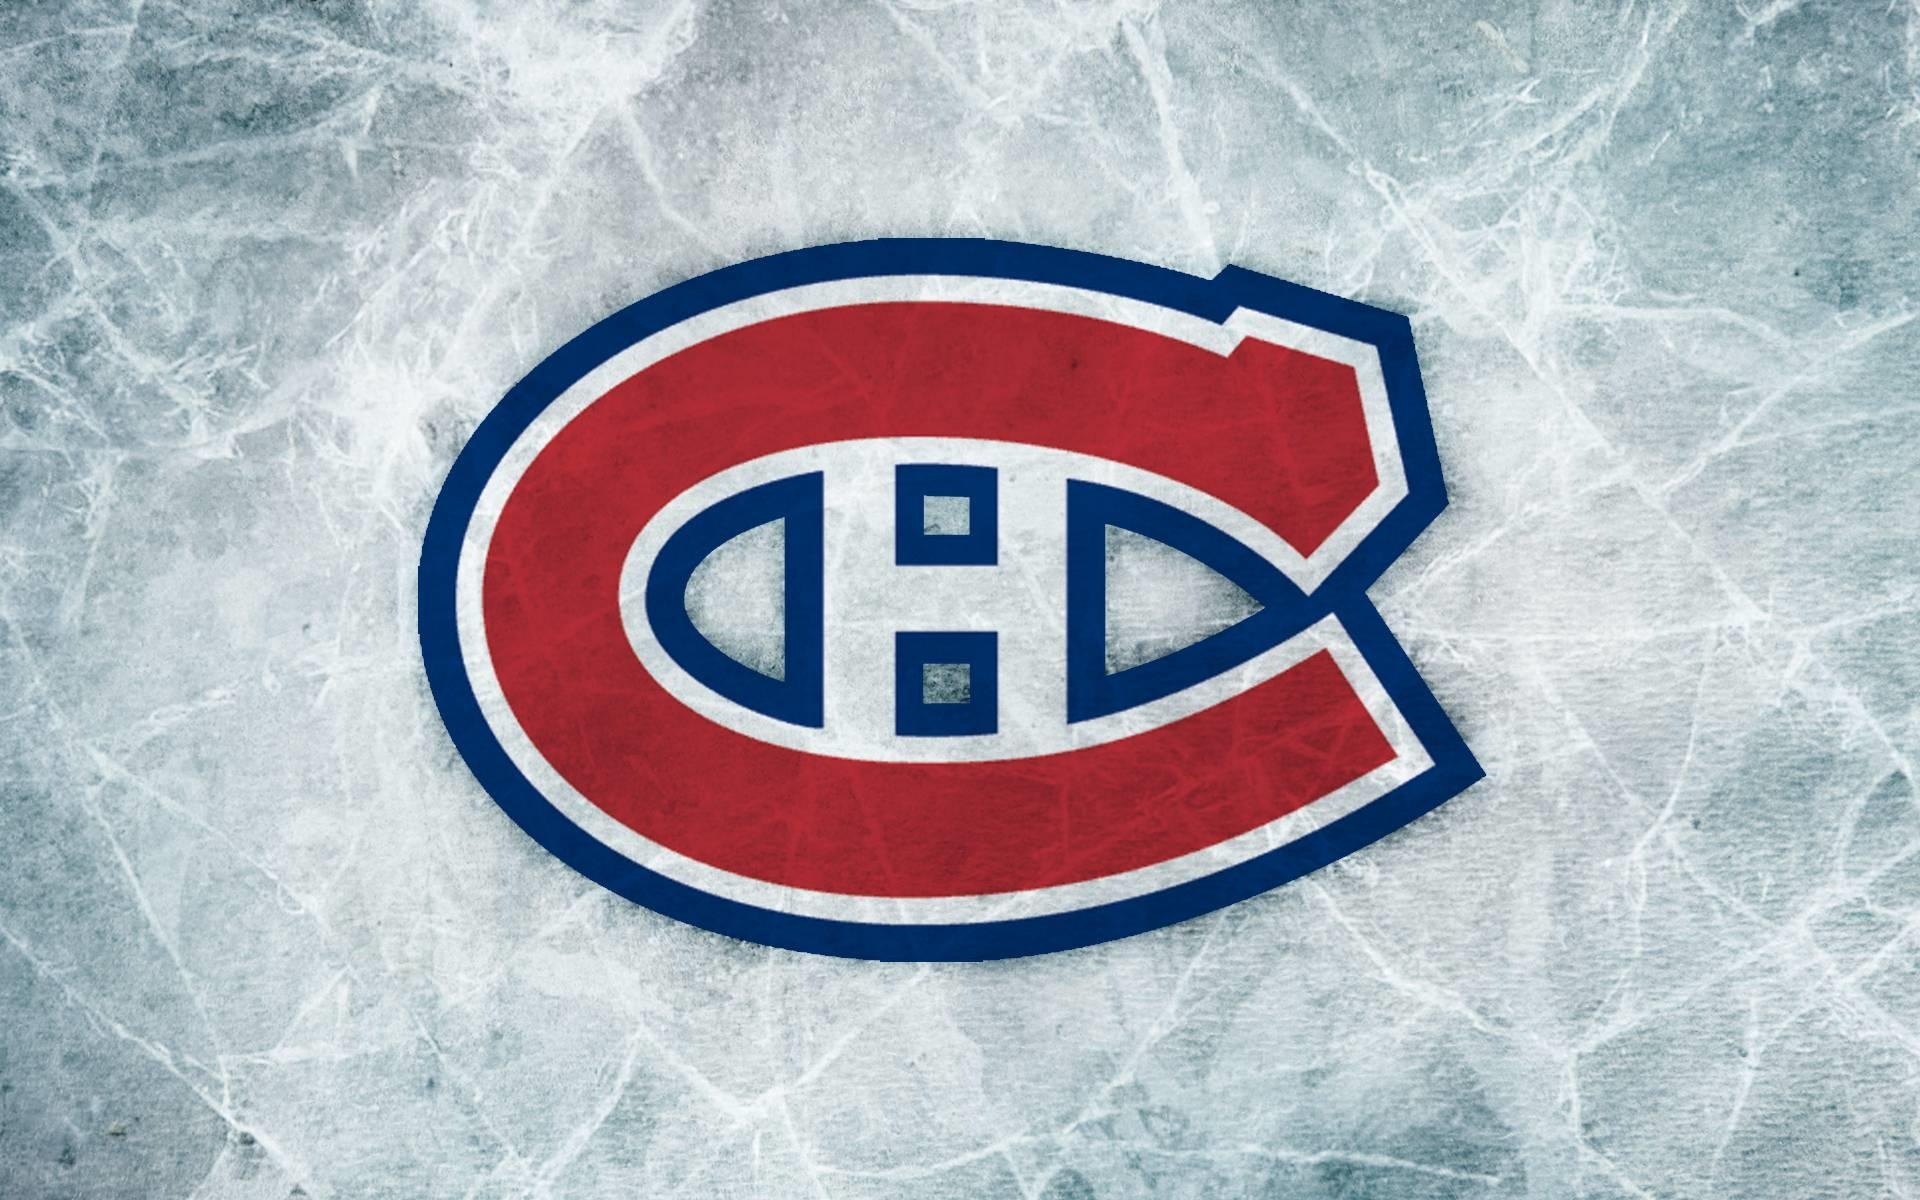 Montreal Canadiens Logos Download